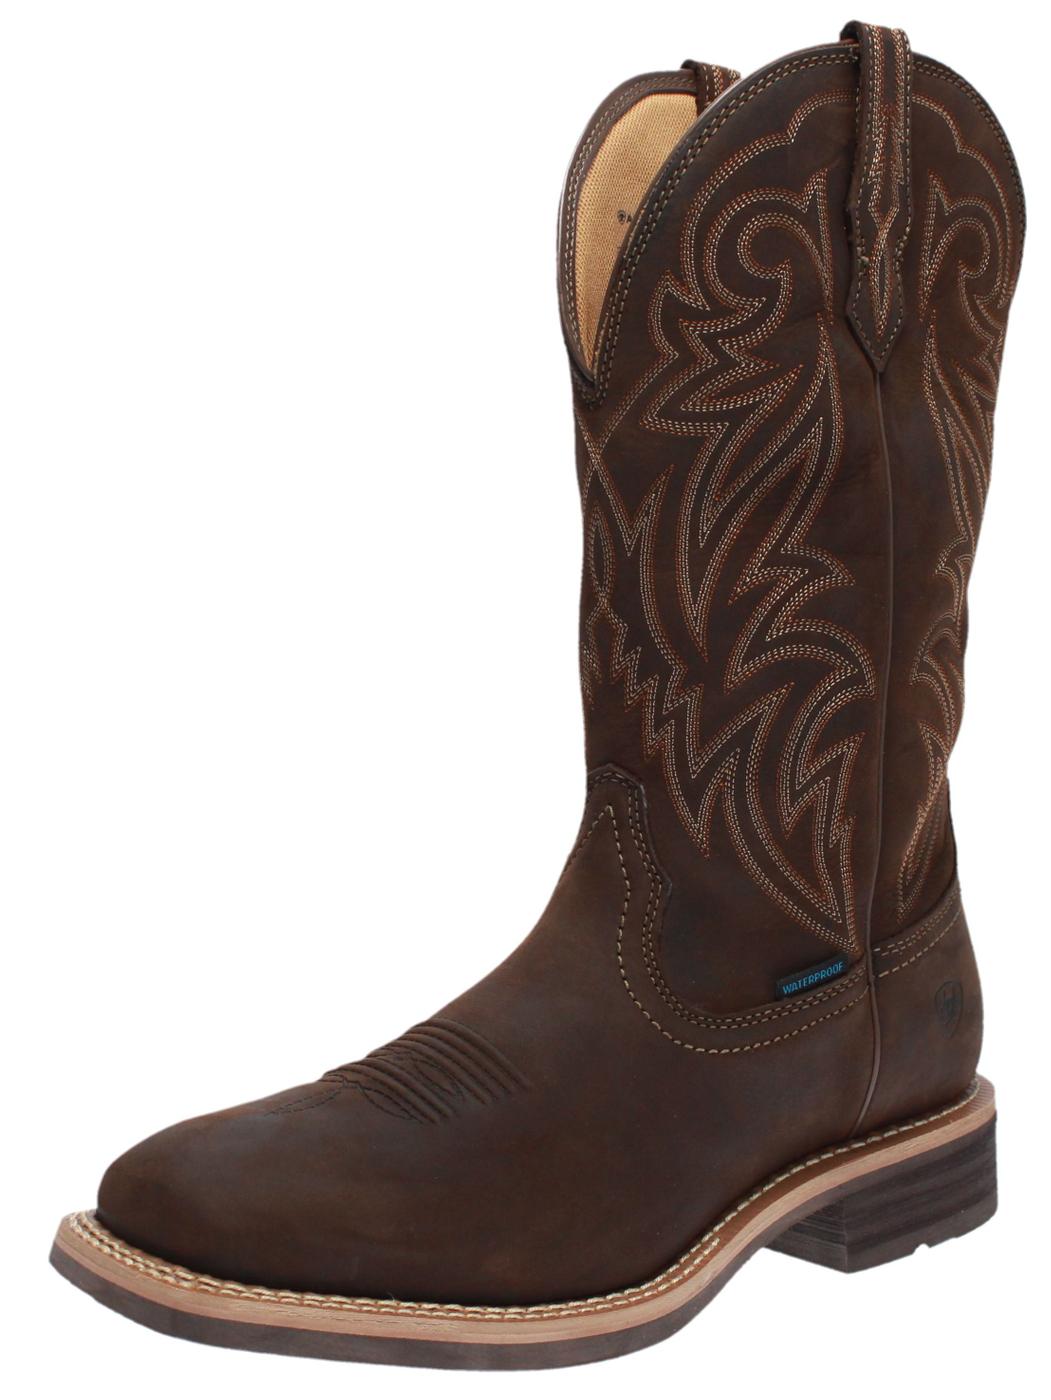 ARIAT 25134 TOMBSTONE H2O Brown waterproof men's western boots - brown